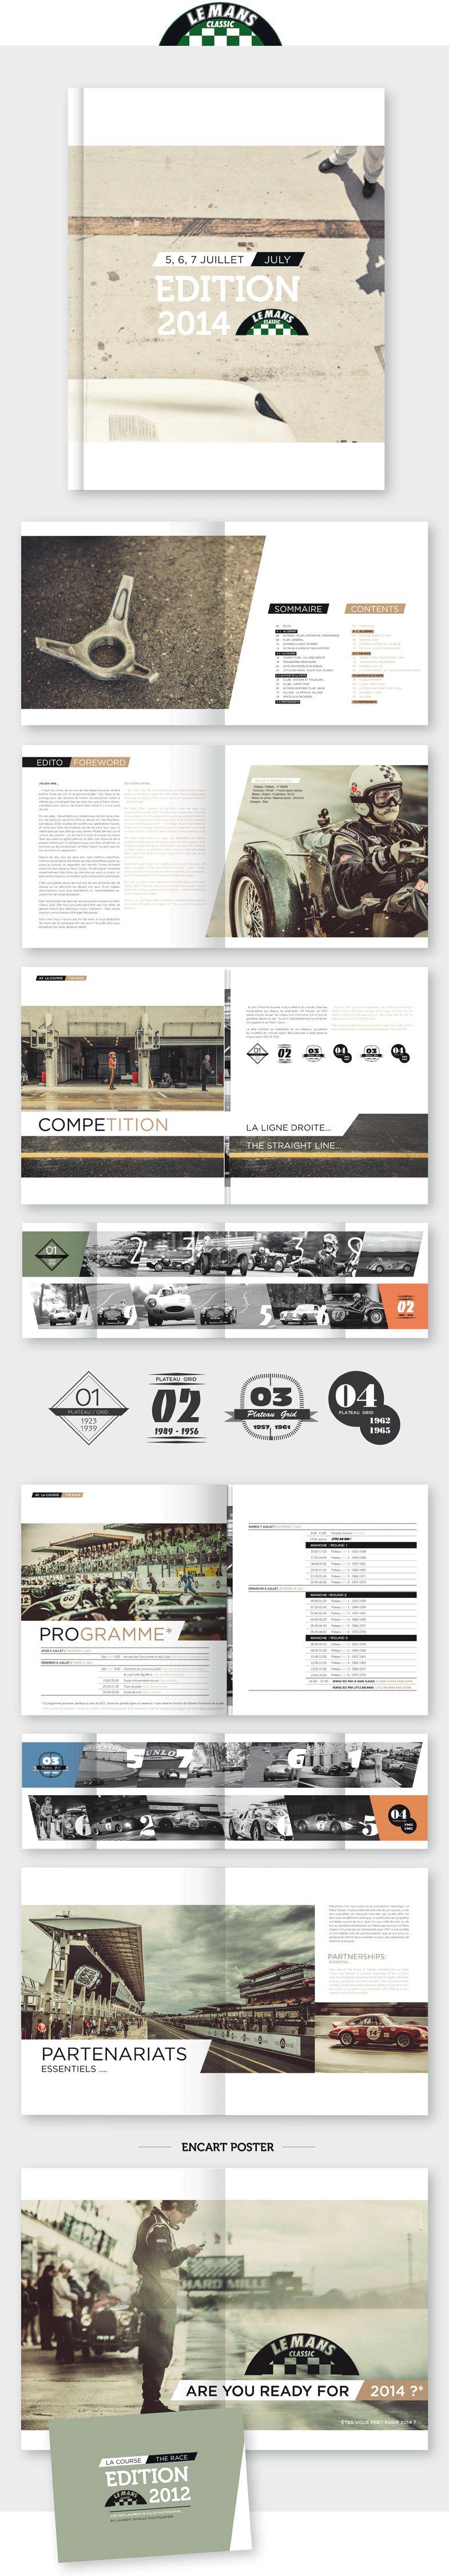 Brochure recherche sponsor